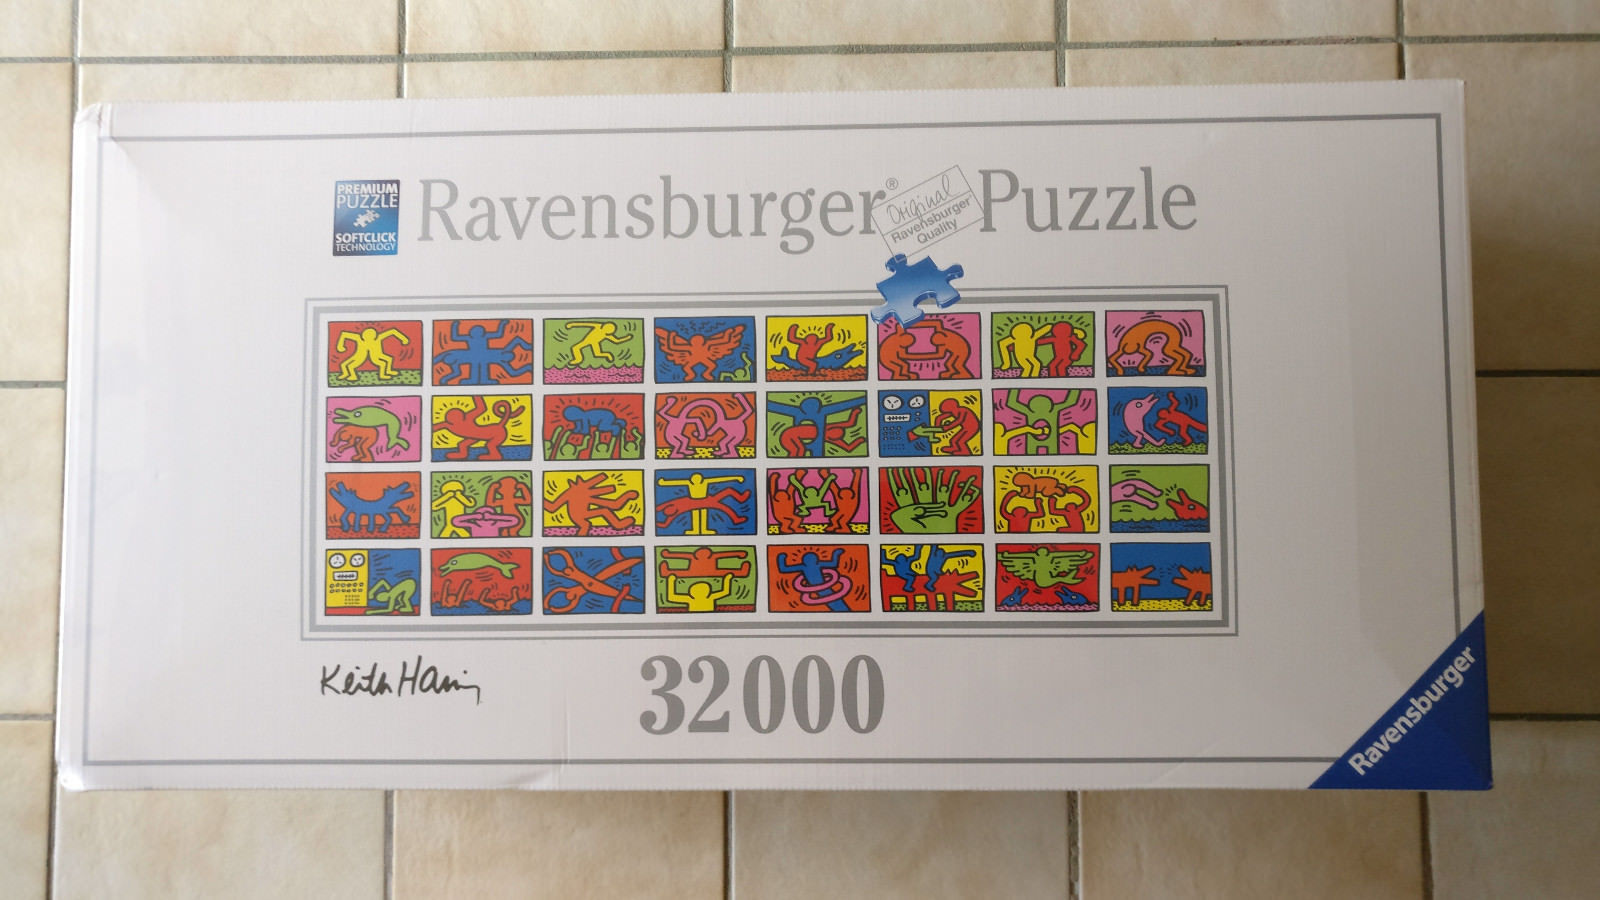 32000 Teile Ravensburger® Puzzle 17838 Keith Haring Double Retrospect NEU/OVP